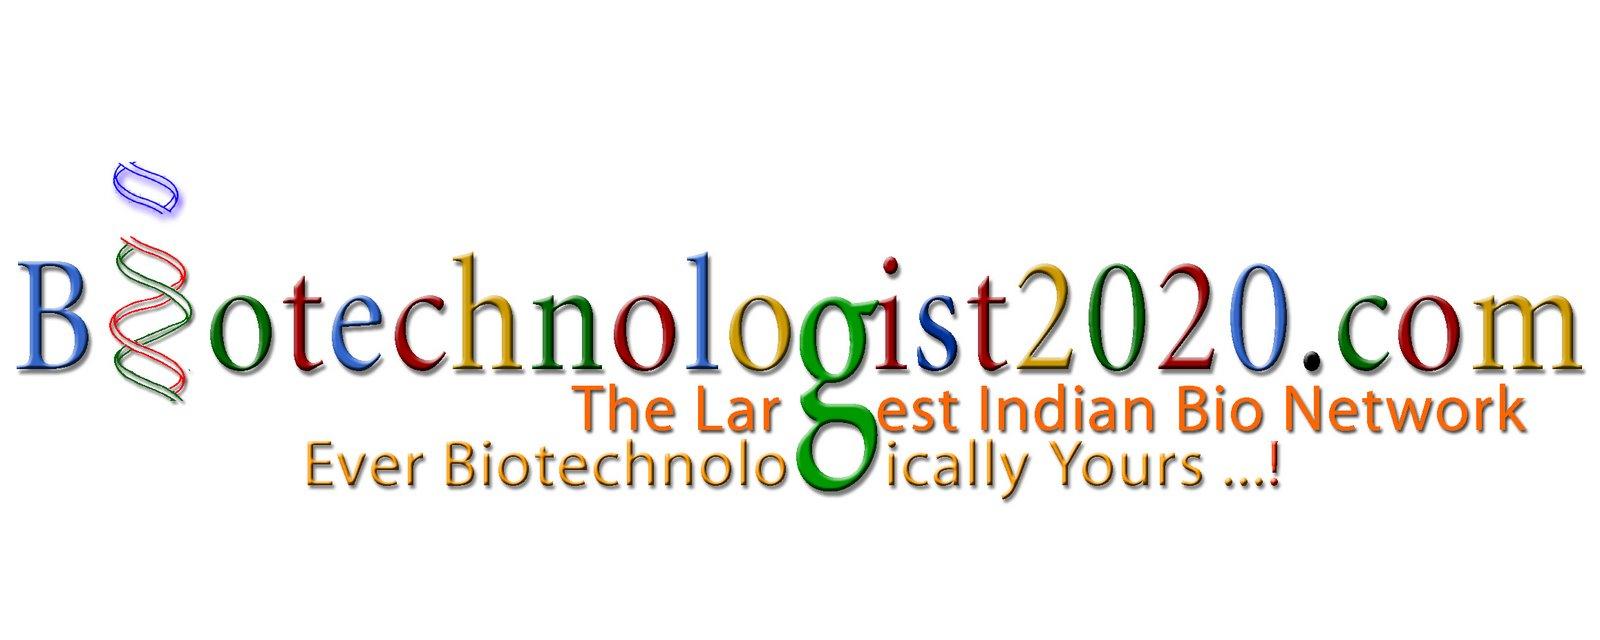 Biotechnologist2020